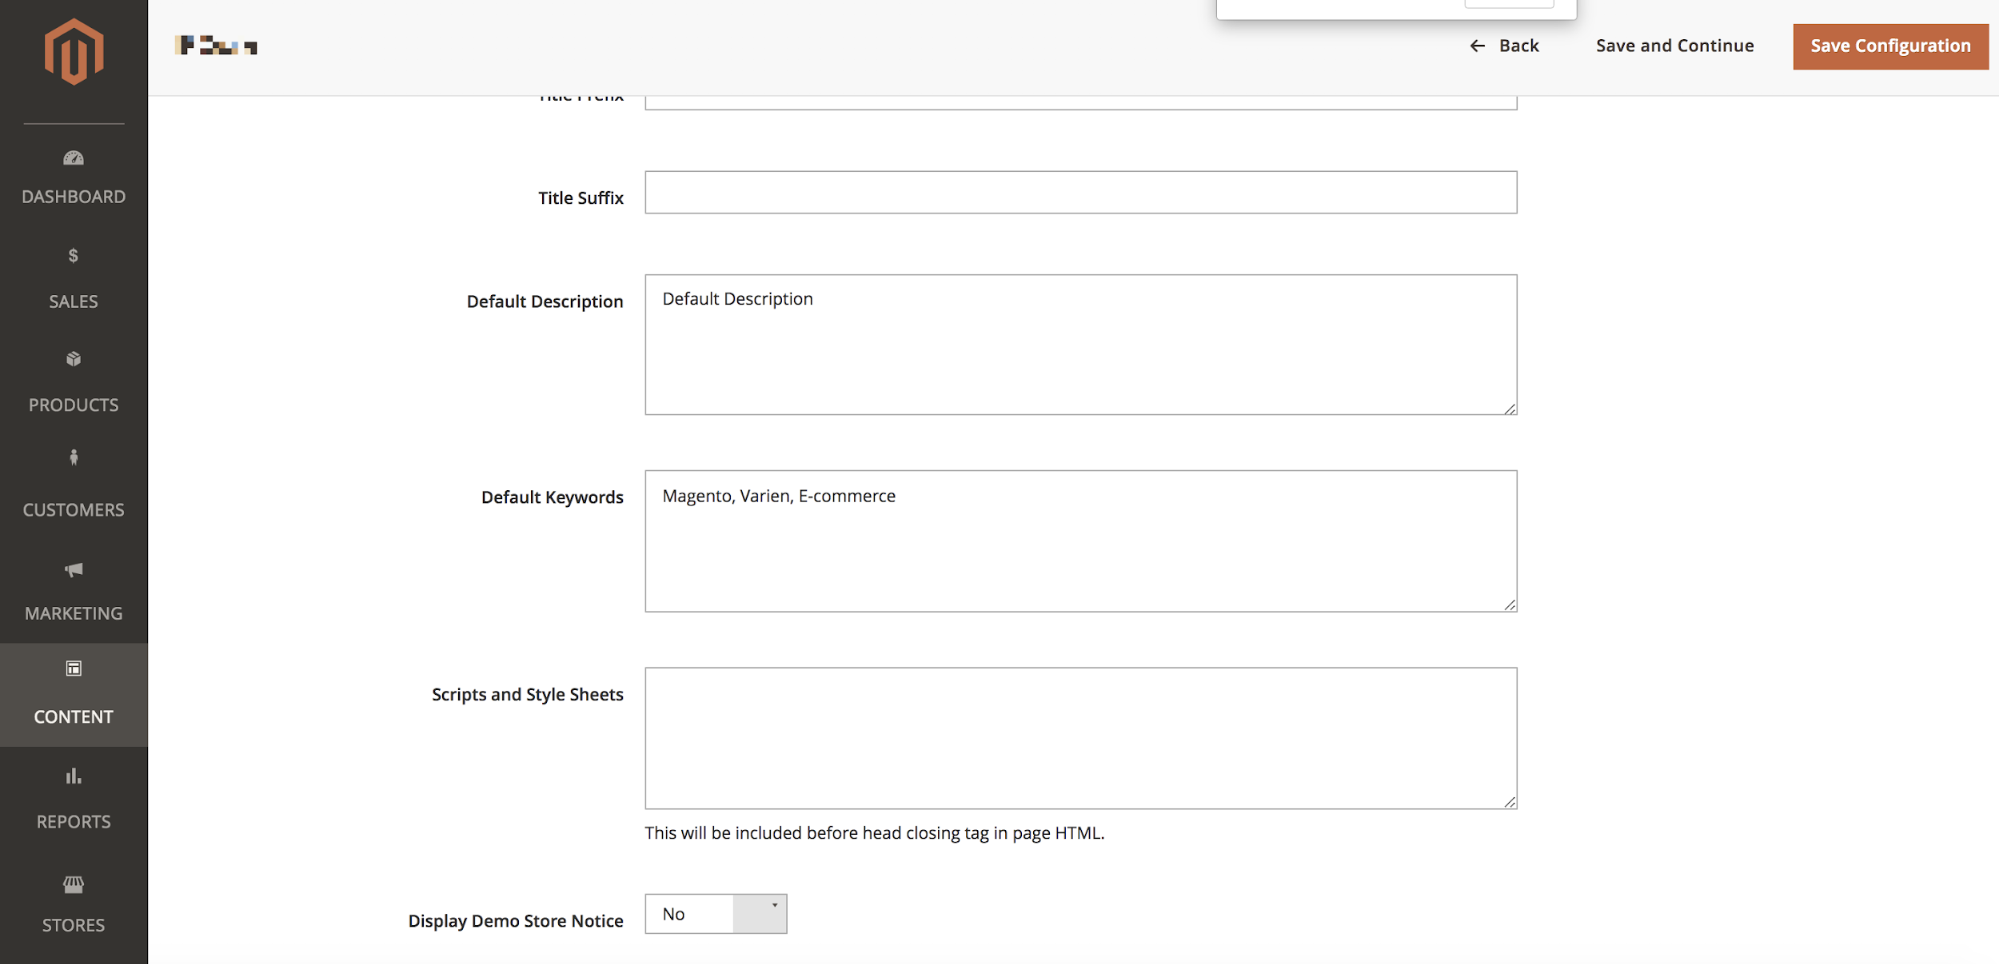 使用hotjar在wordprss magento gtm 網站上的設定11